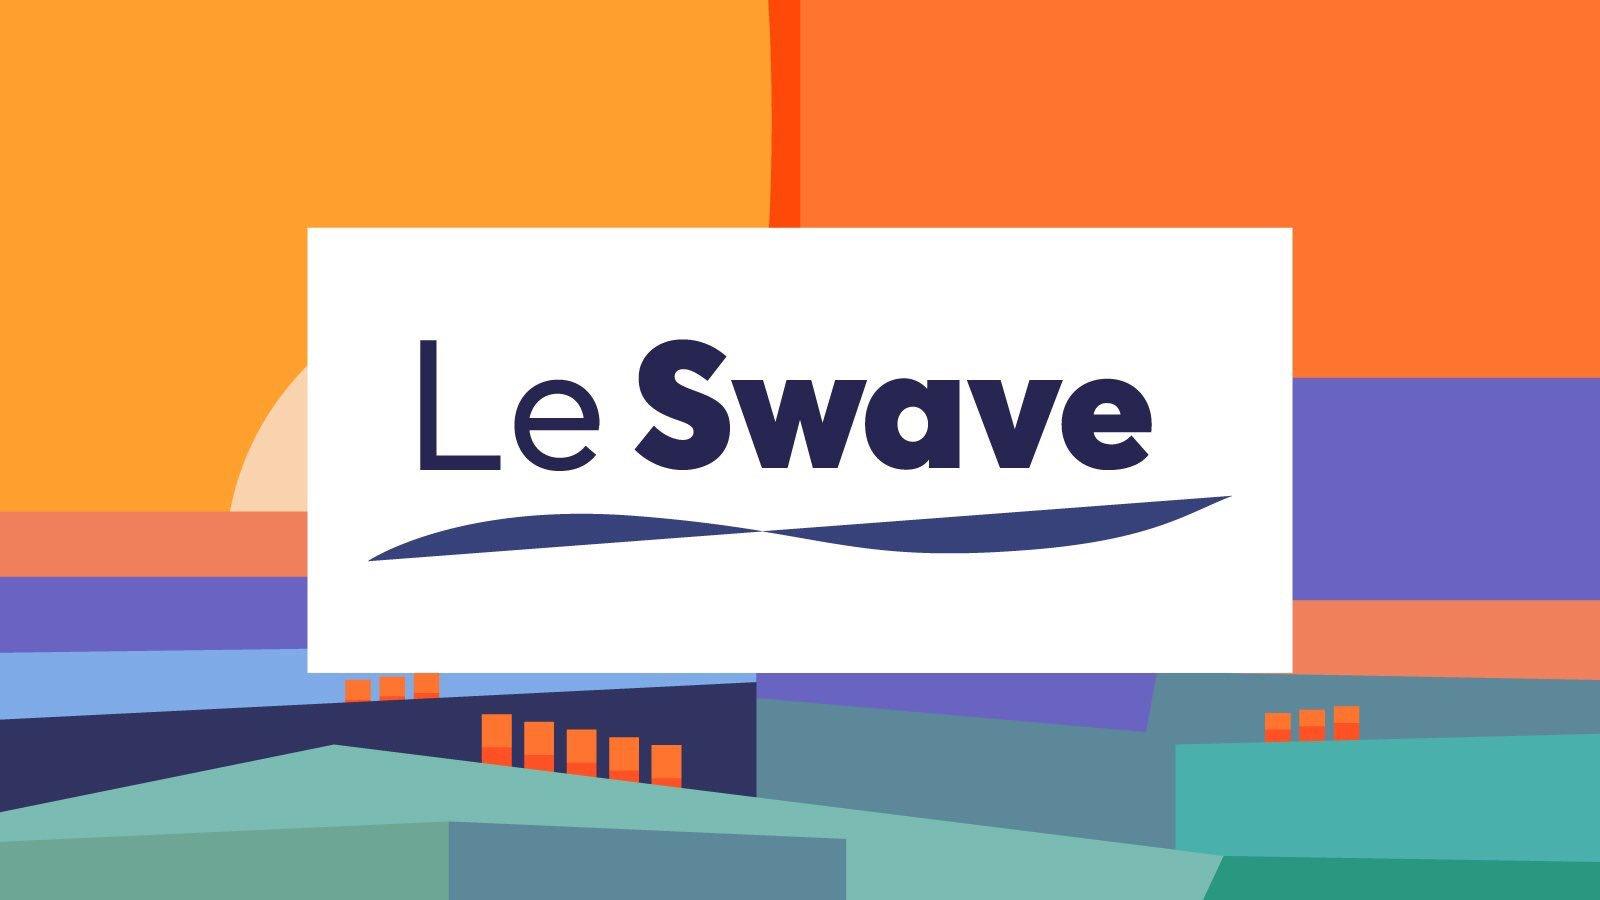 le swave